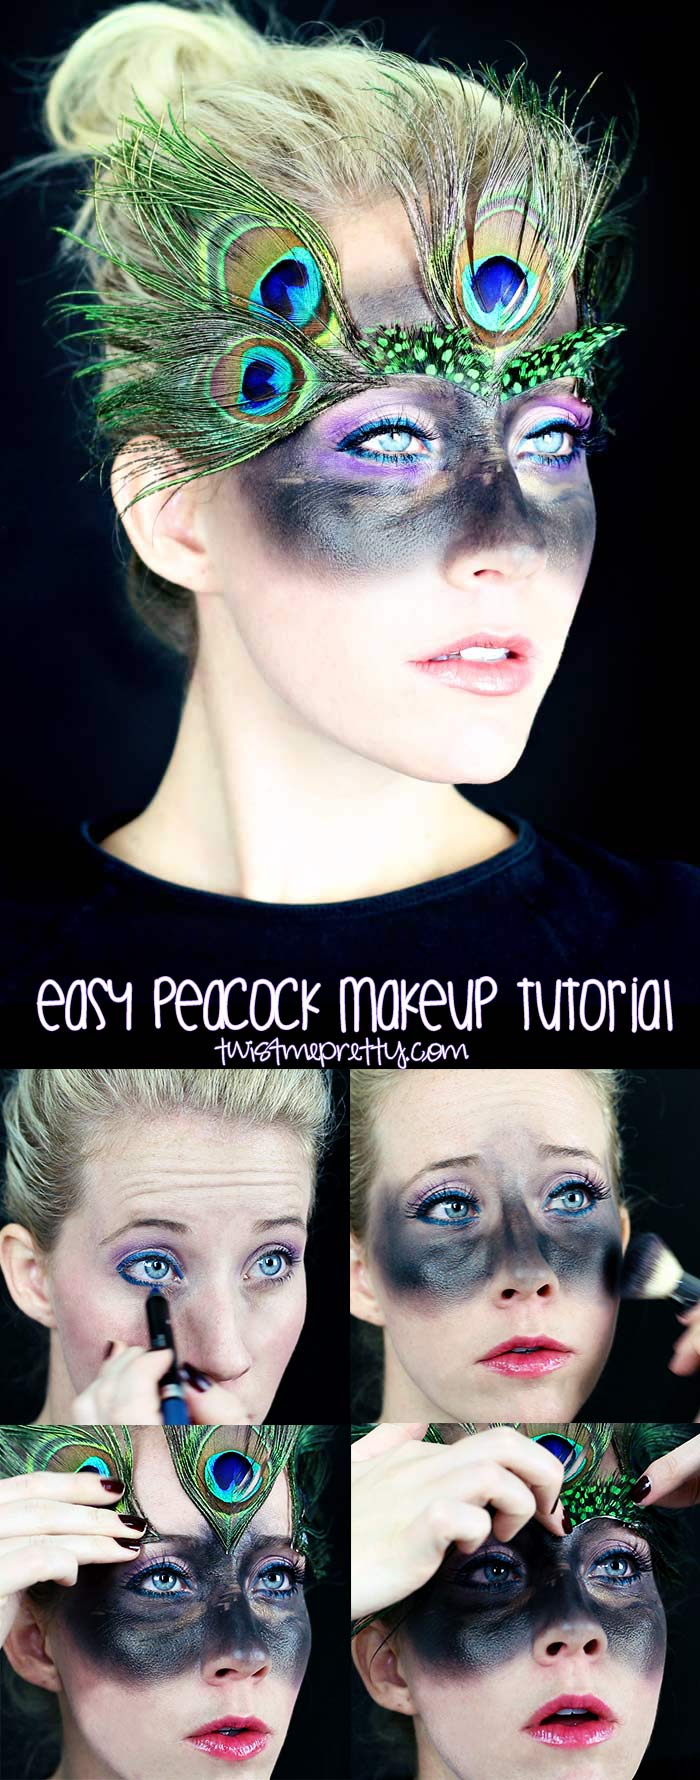 easy peacock makeup tutorial Easy Peacock Makeup